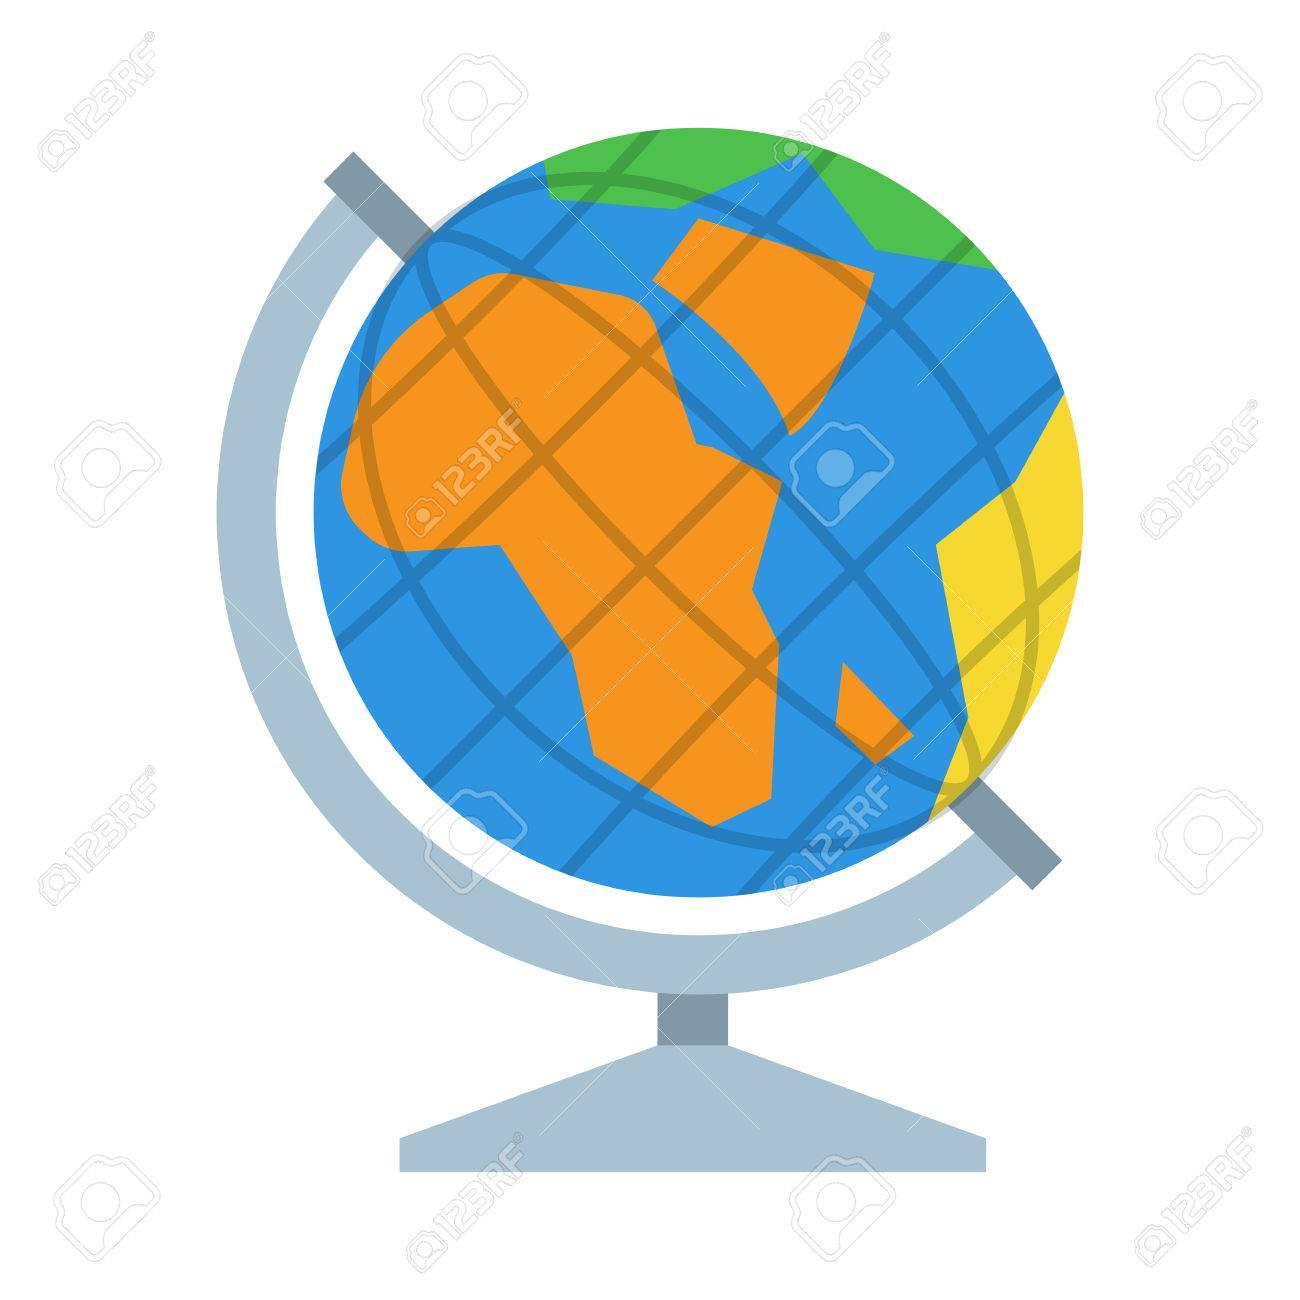 hight resolution of table world globe vector icon earth model illustration stock vector 62357312